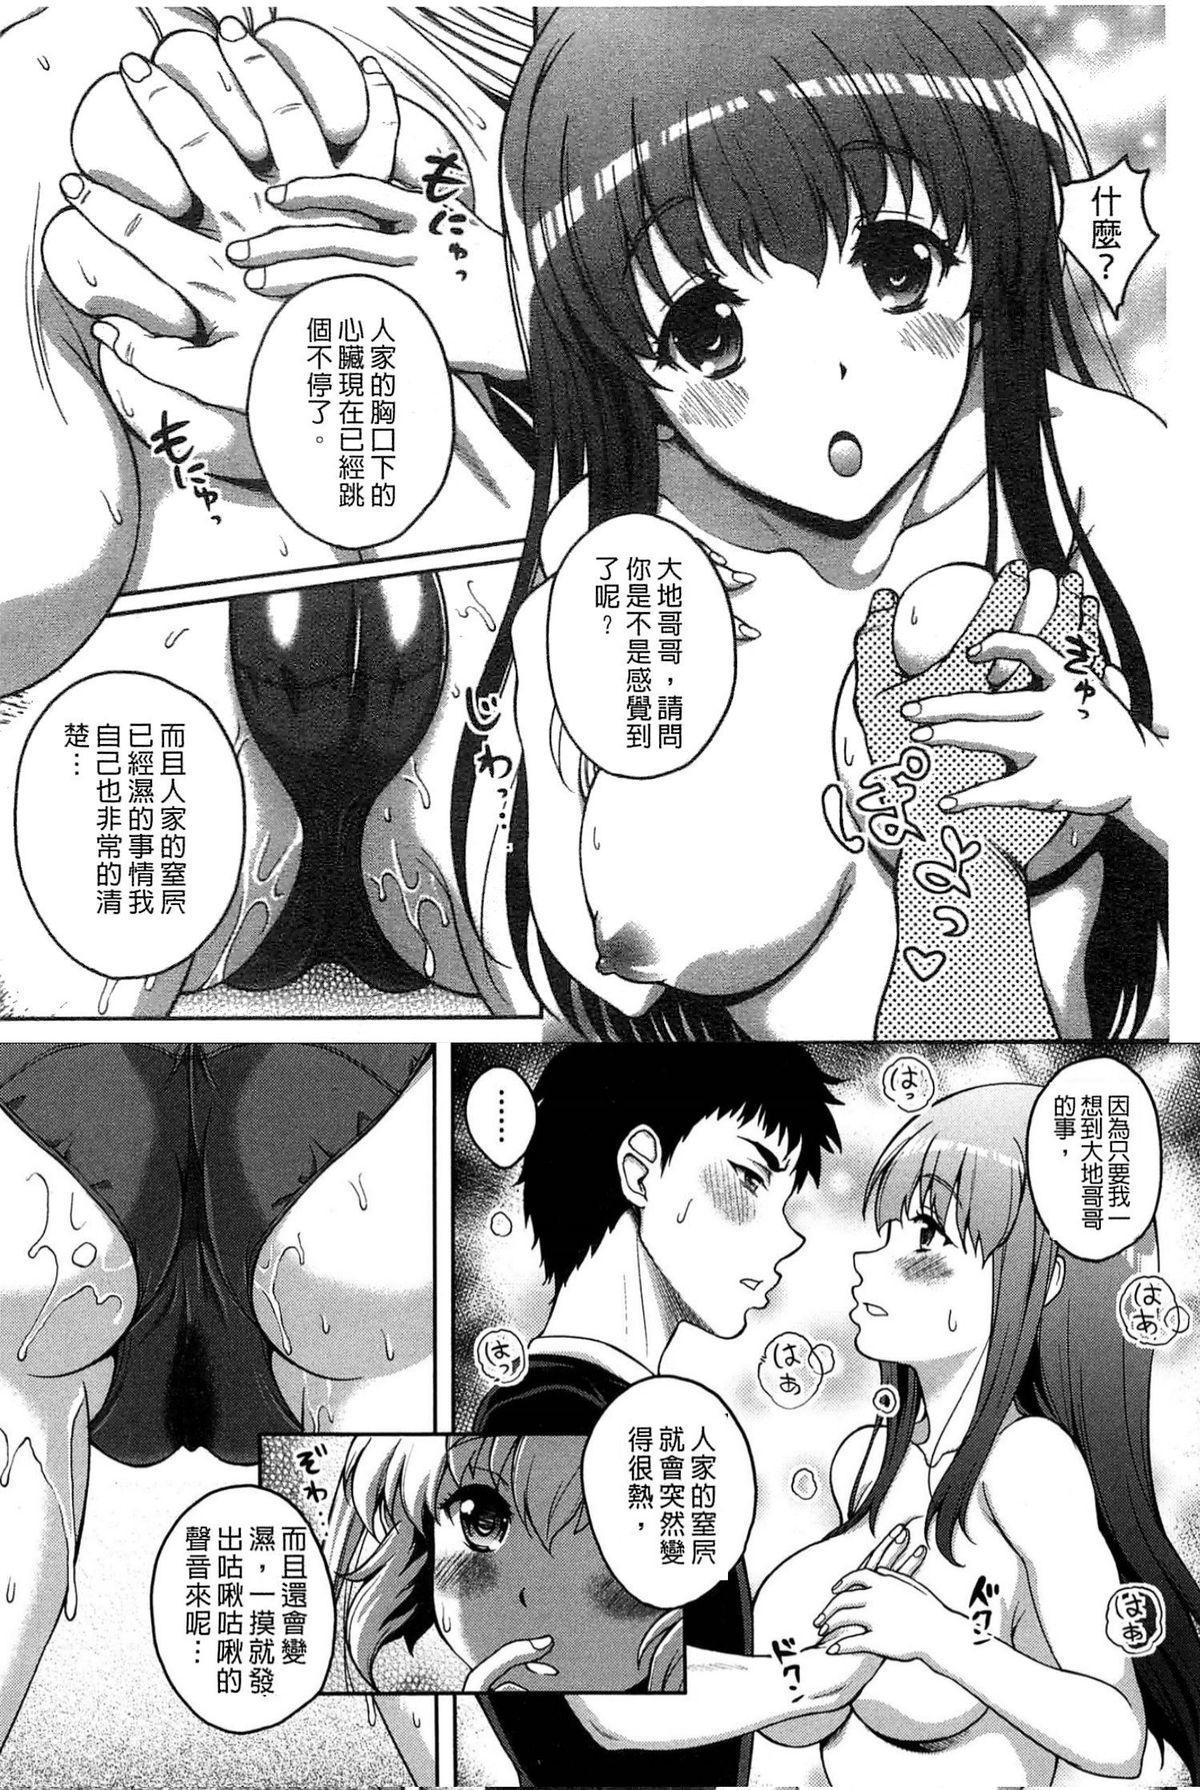 Hajimete nan dakara - First sexual experience 134